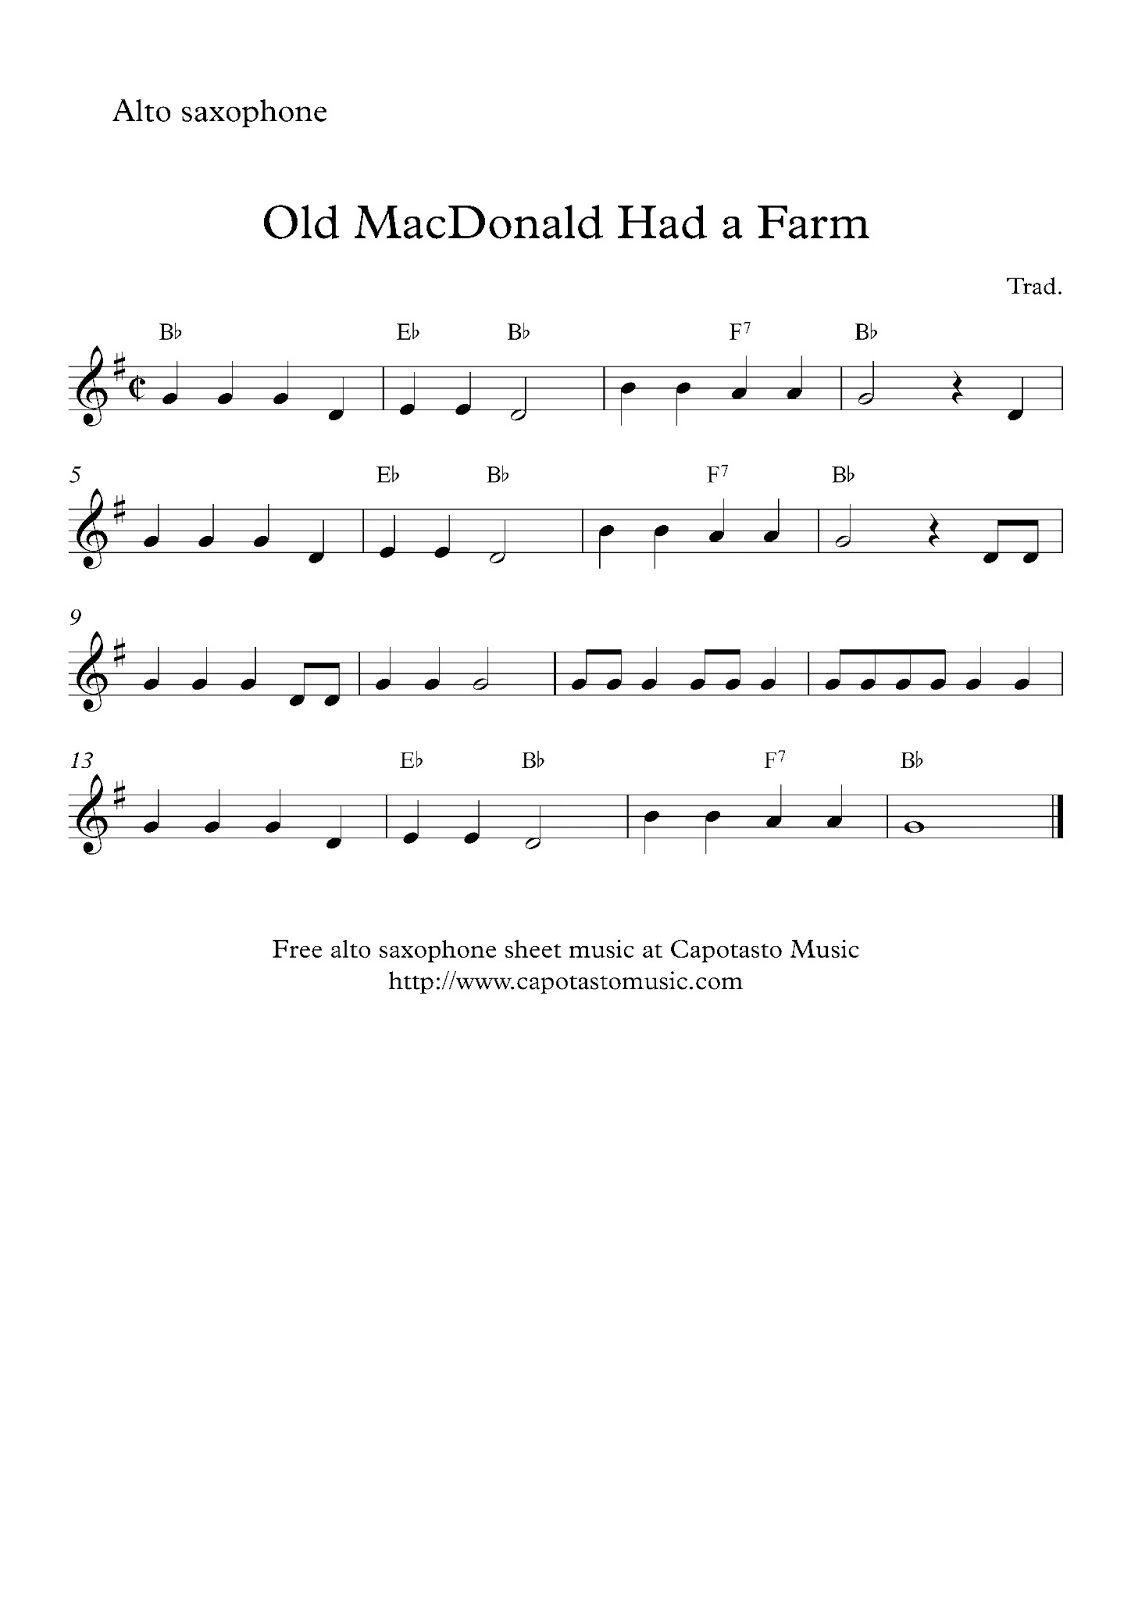 Alto Sax Easy Songs   Free Sheet Music Scores: Free Easy Alto - Free Printable Alto Saxophone Sheet Music